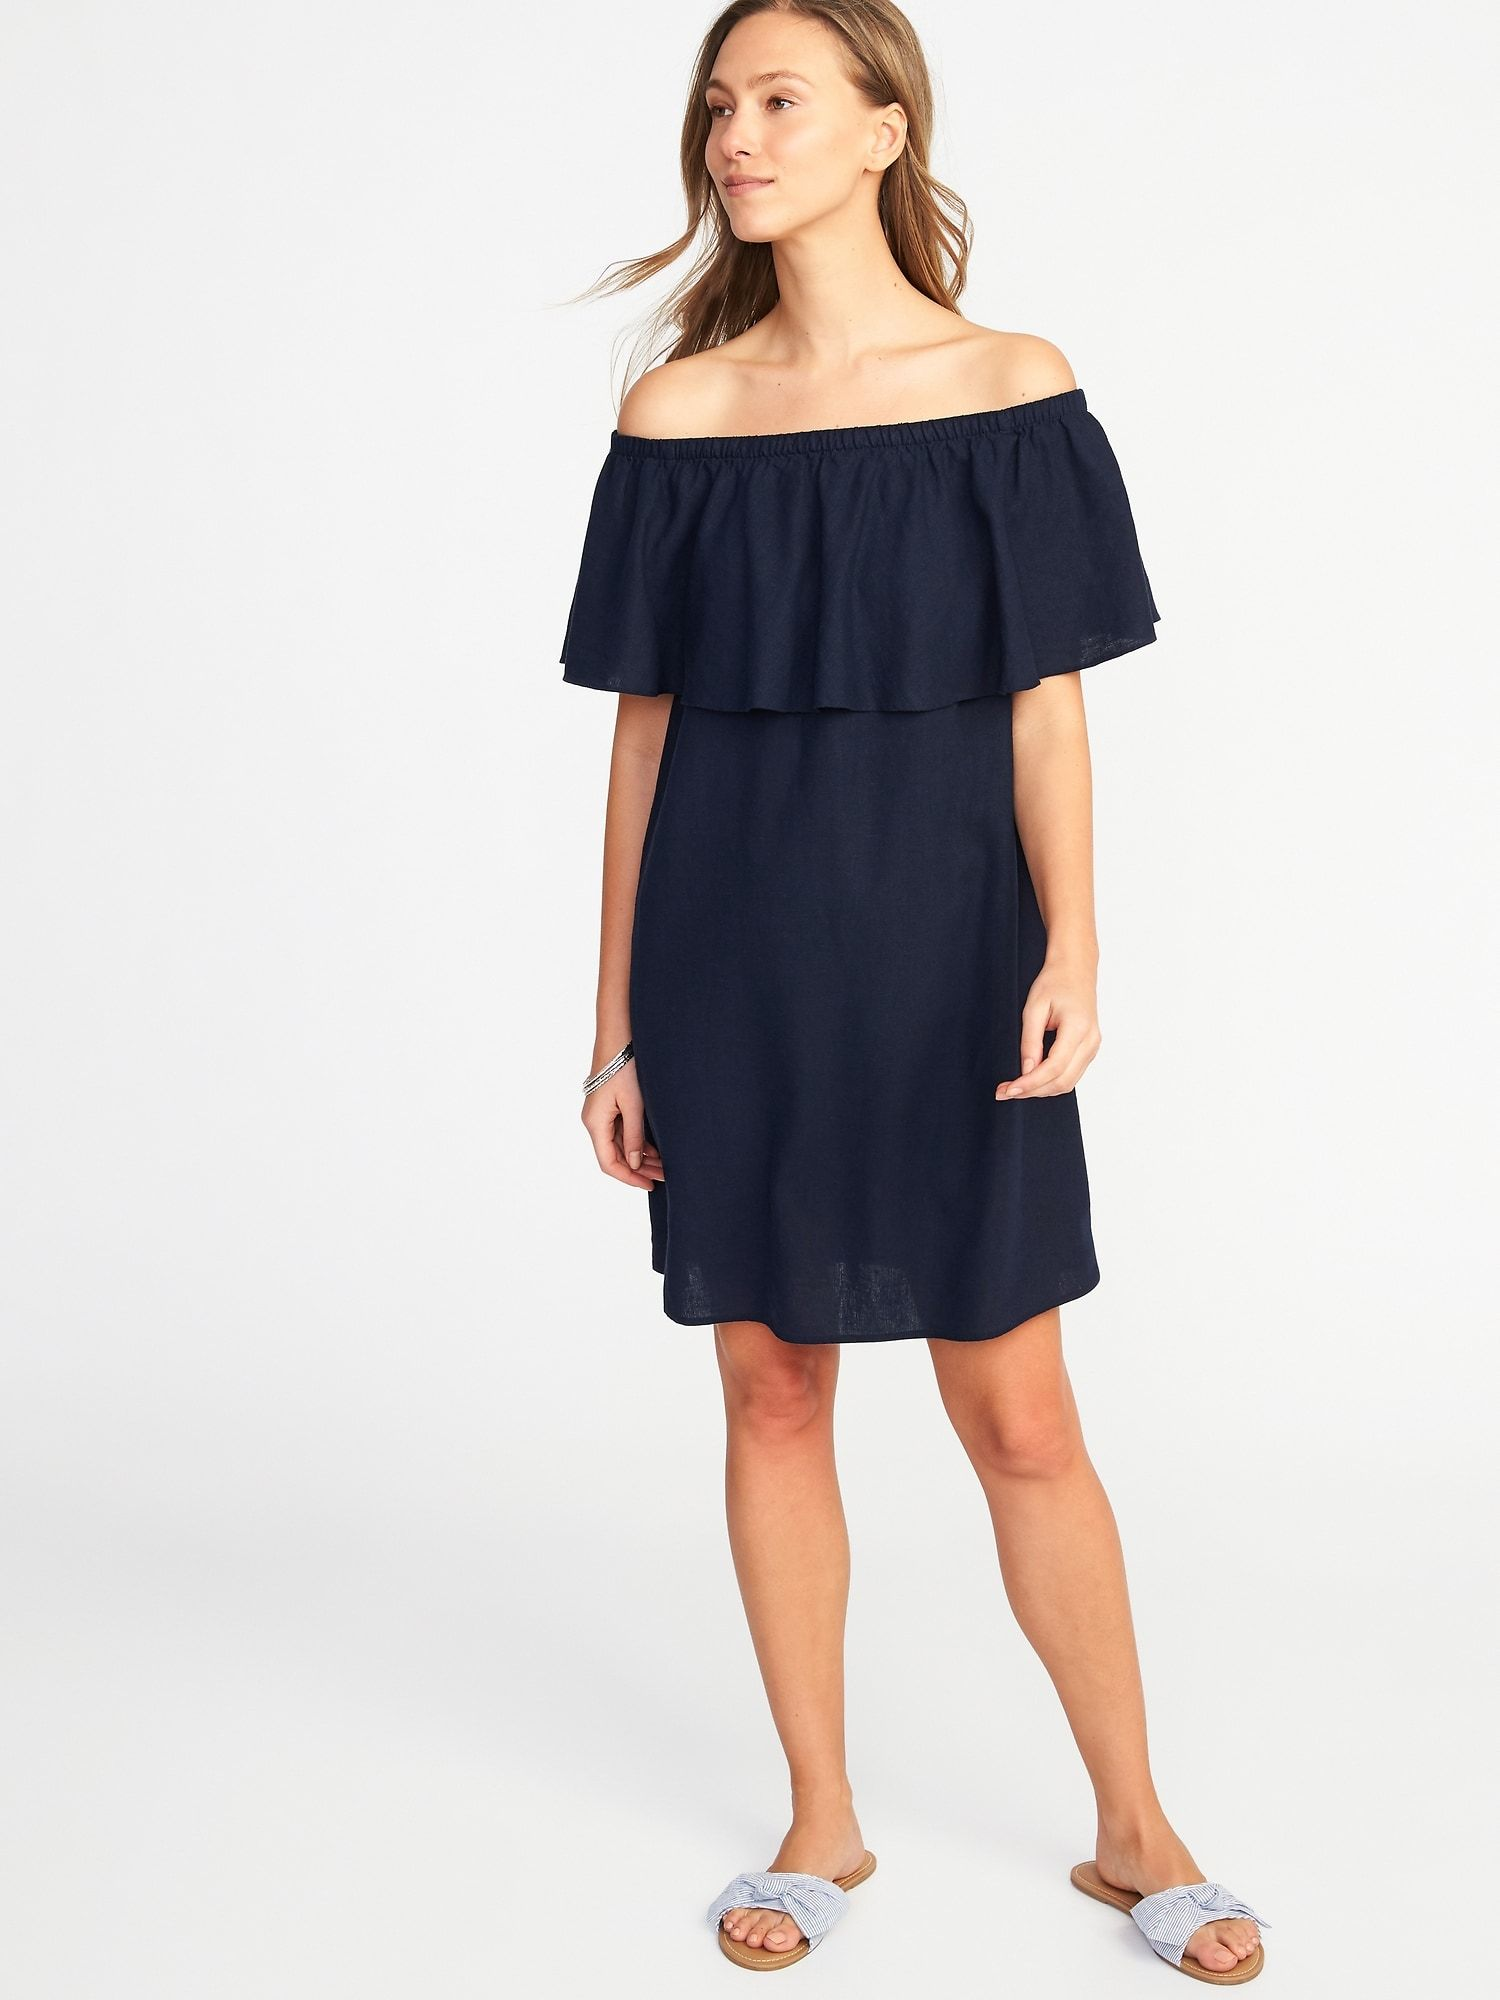 b2af0302ac9 product photo Tall Dresses